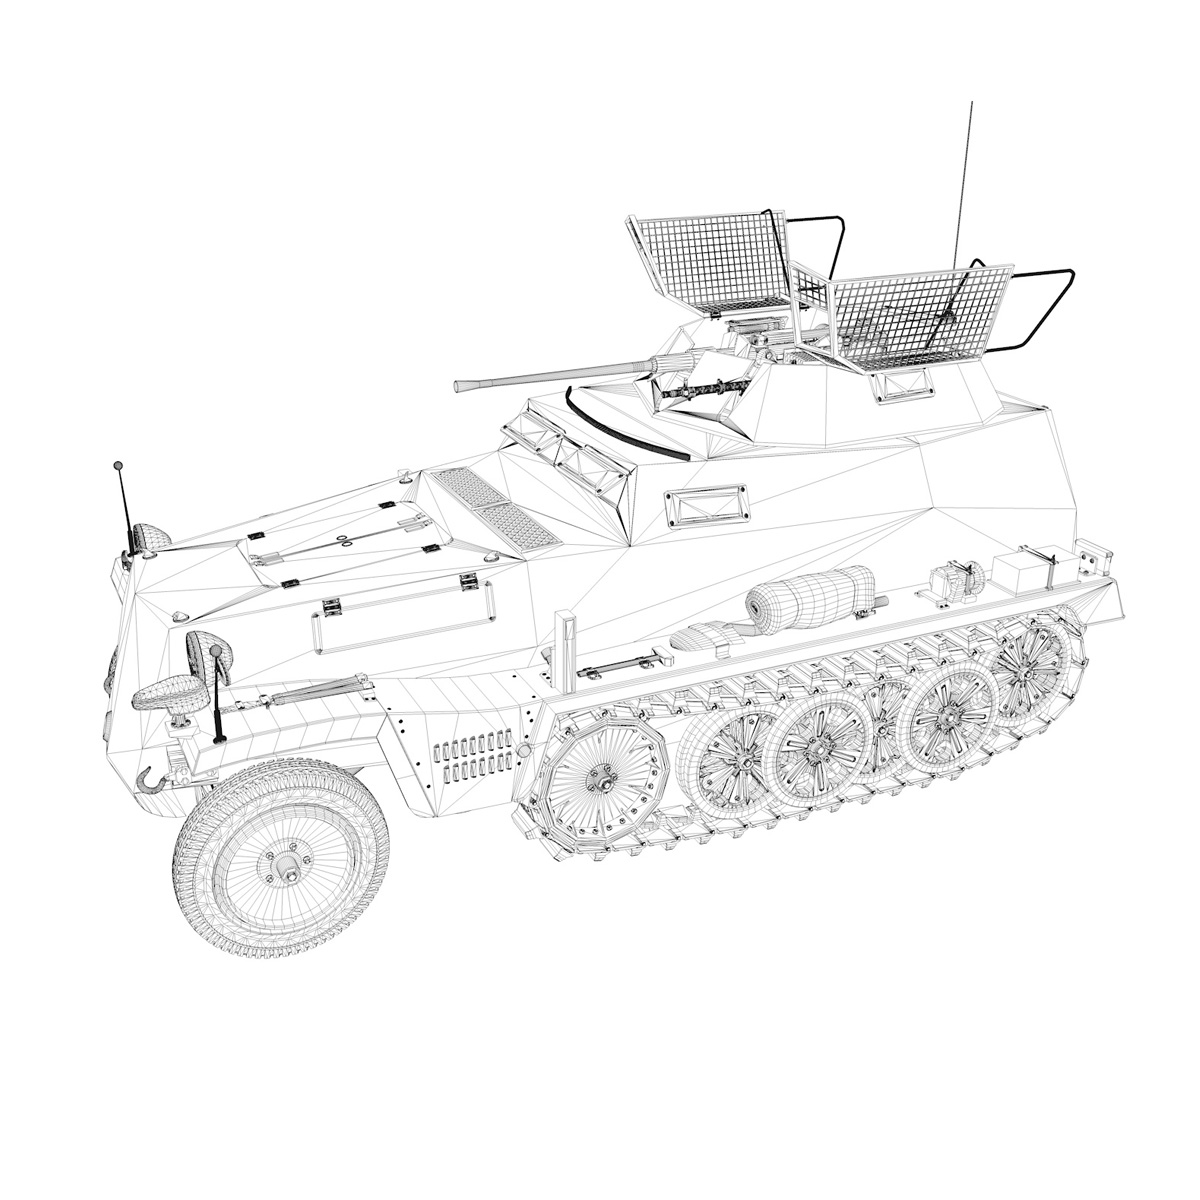 sd.kfz 250 9 – half-track armored vehicle 3d model 3ds fbx c4d lwo obj 198222